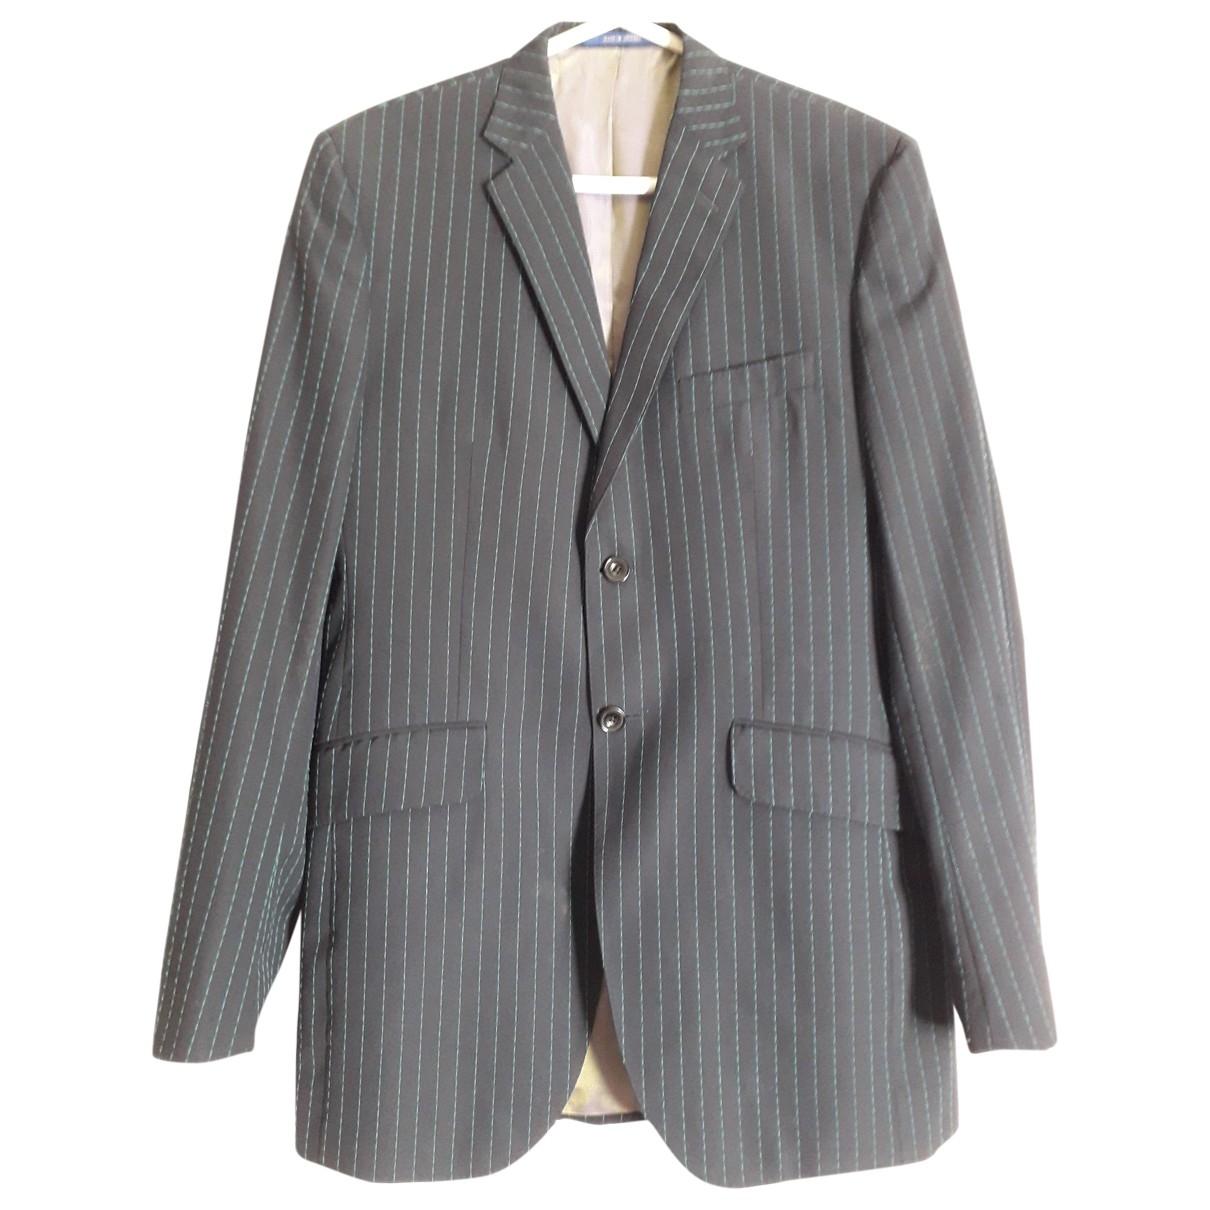 Ozwald Boateng \N Blue Wool jacket  for Men M